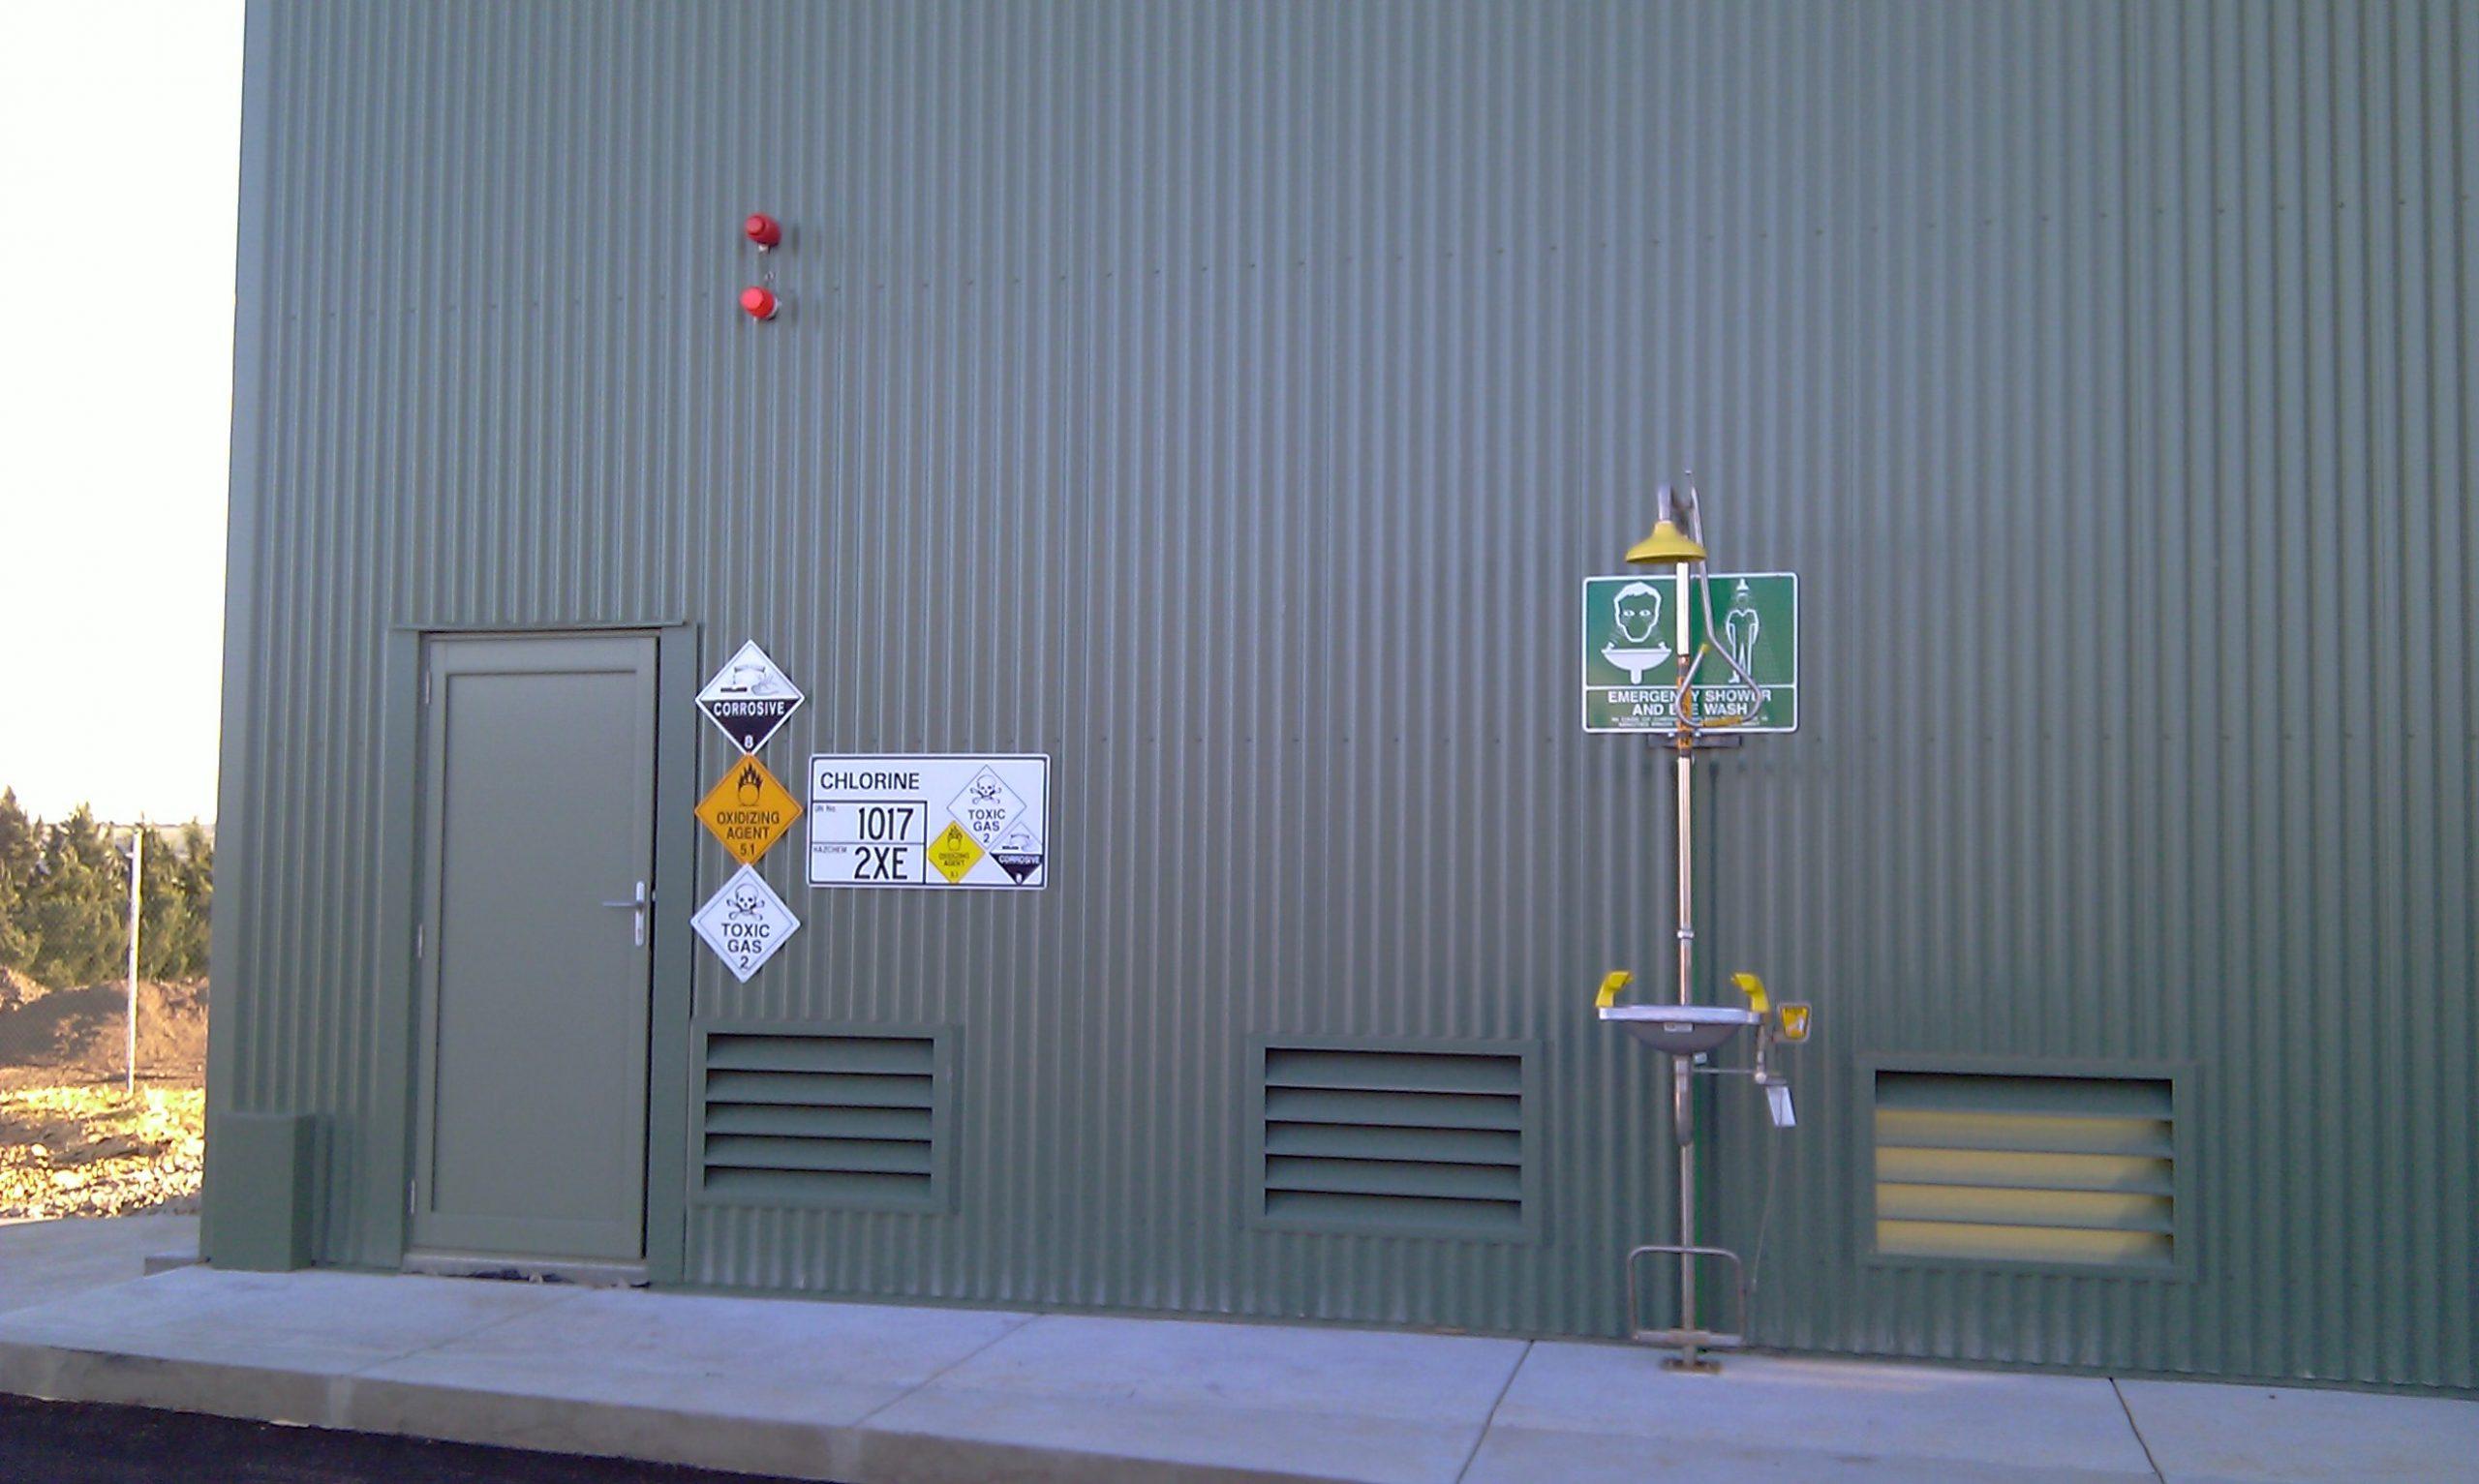 Woodglen WTP - Chlorine Room and Safety Shower